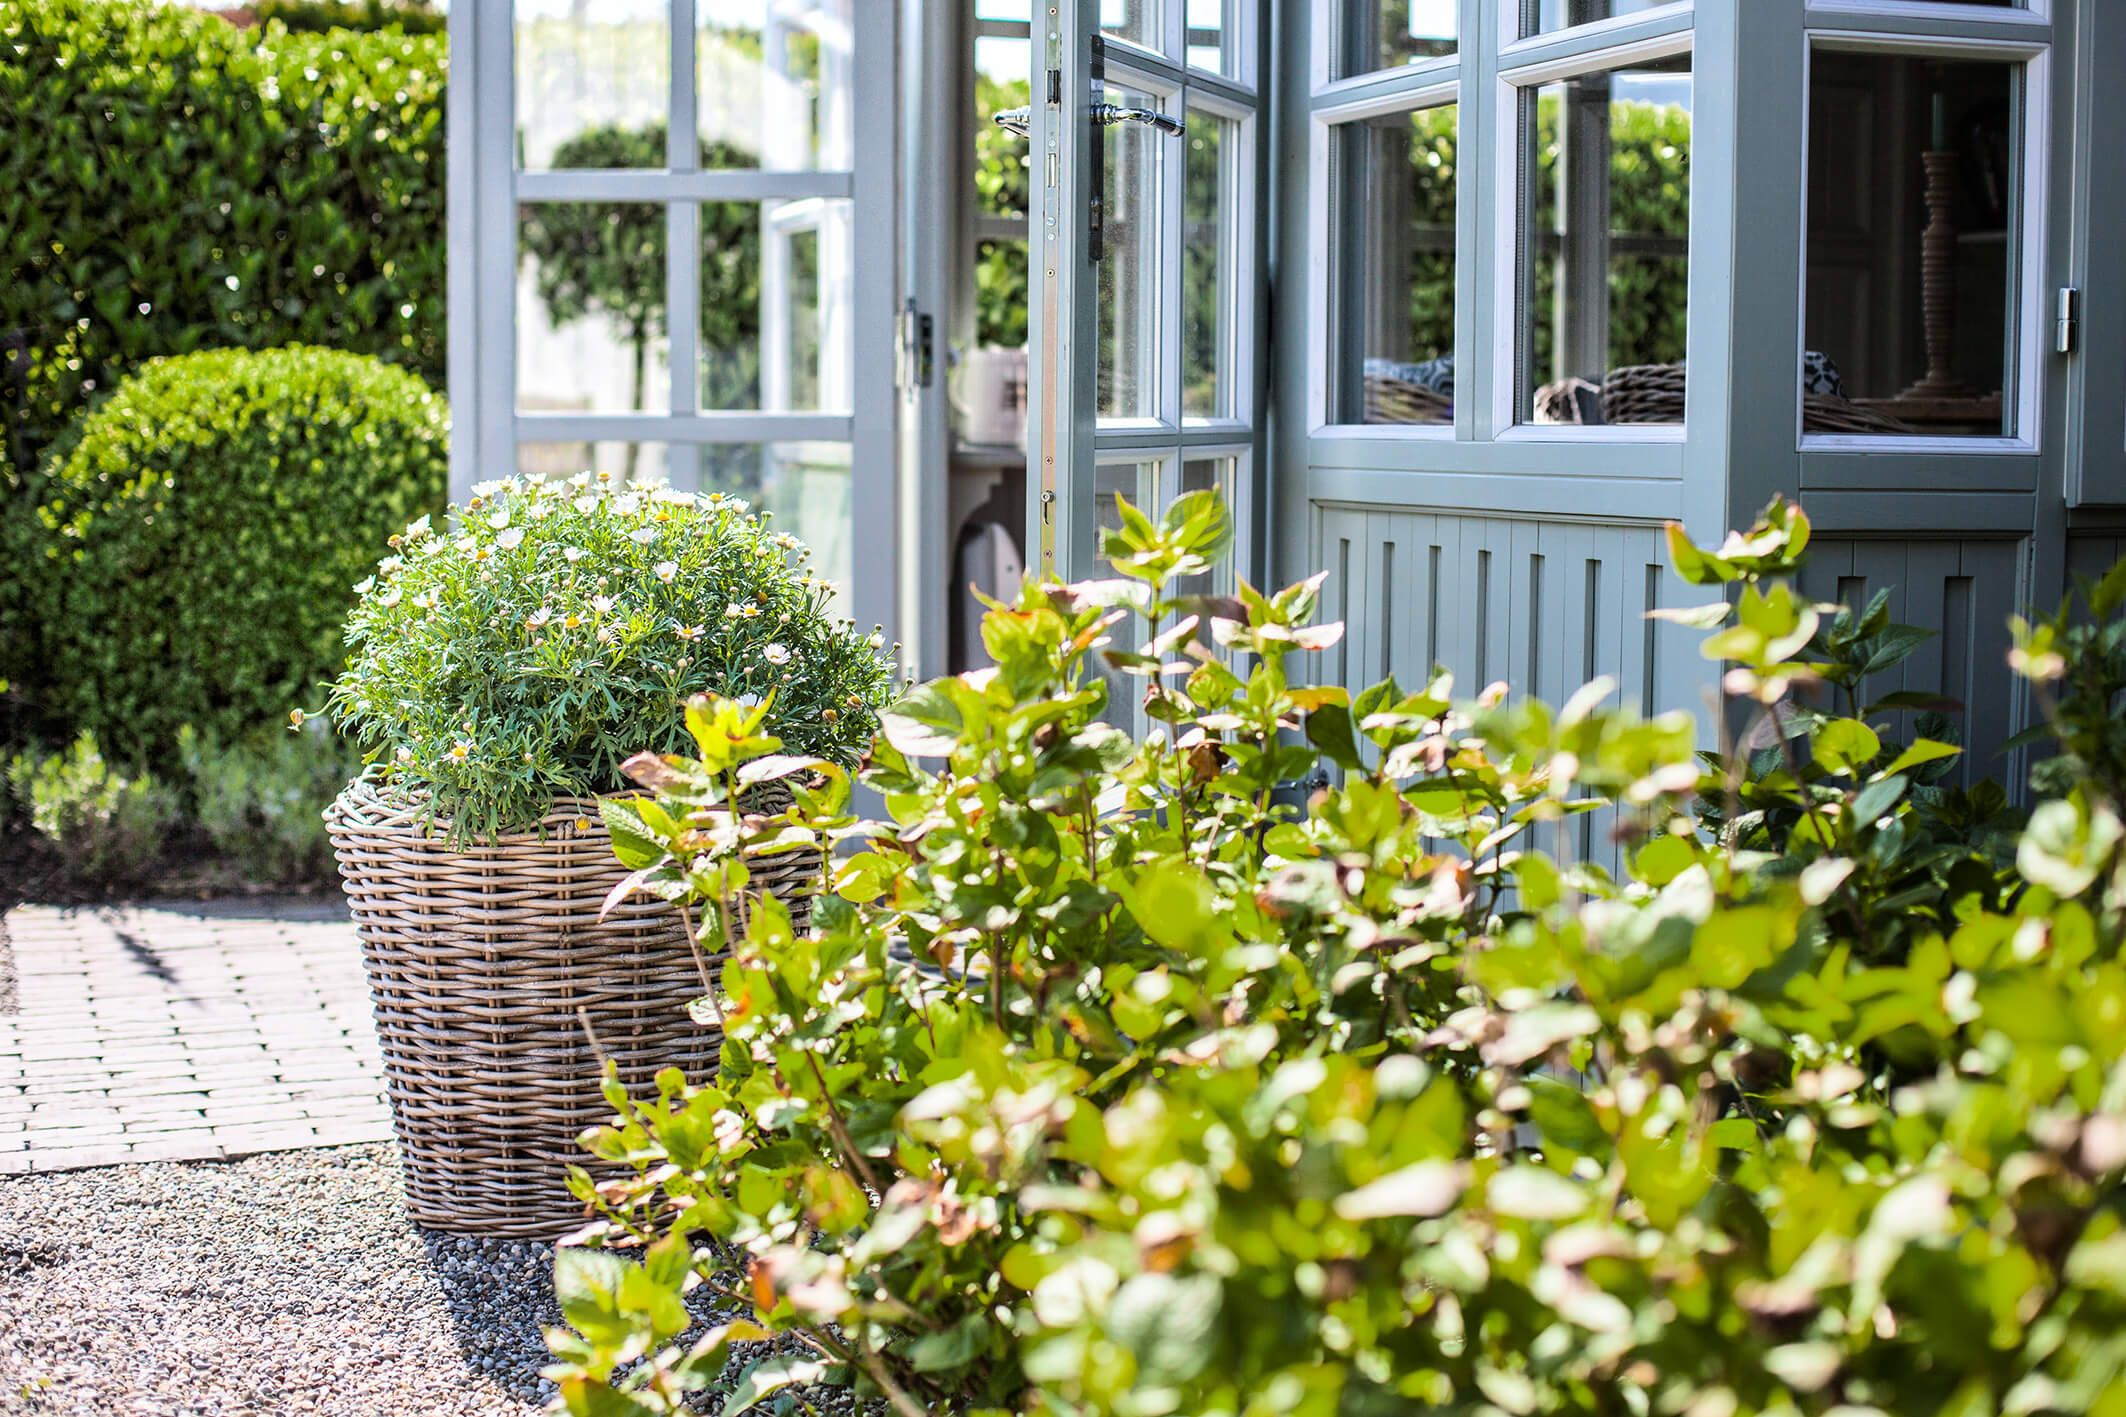 Belgisch Englischer Gartenstil Parc S Gartengestaltung Gartengestaltung Englischer Garten Garten